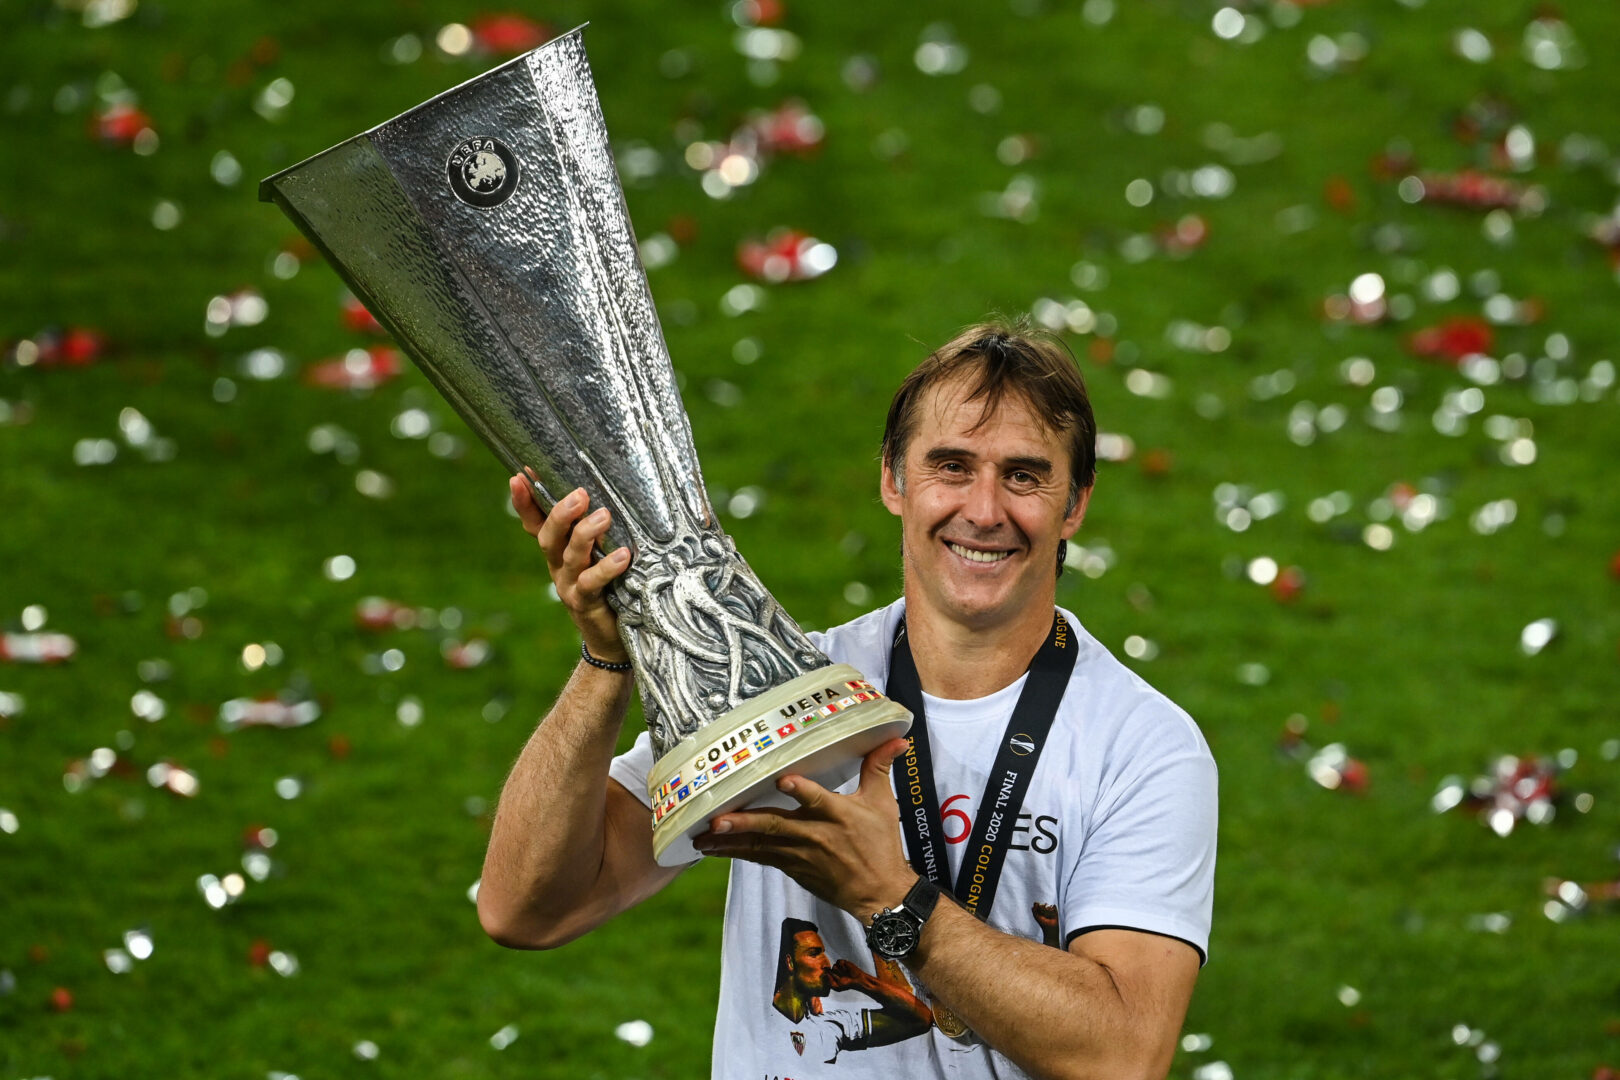 Nächster Rückschlag für Tottenham: Auch Lopetegui wird nicht Trainer